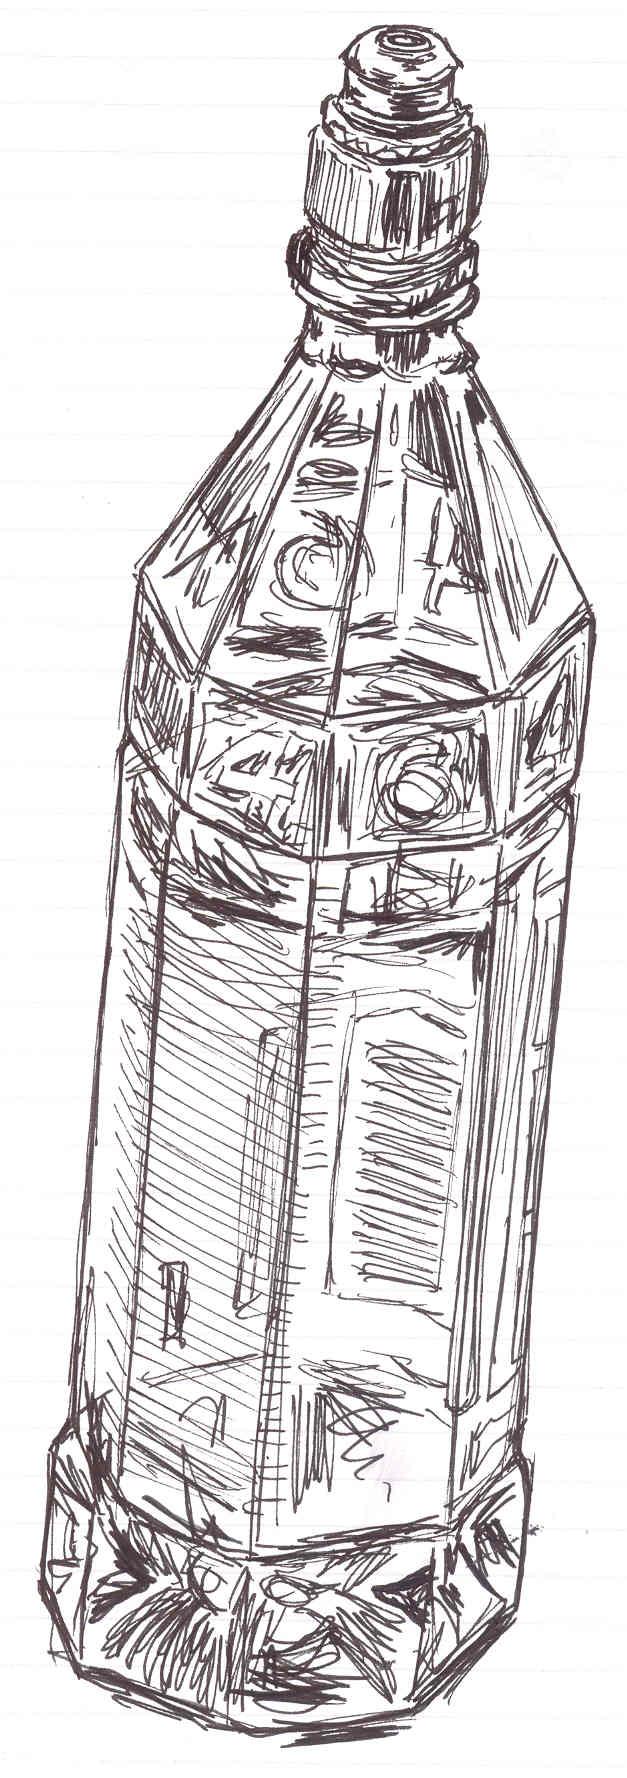 Bottle by katiedraws